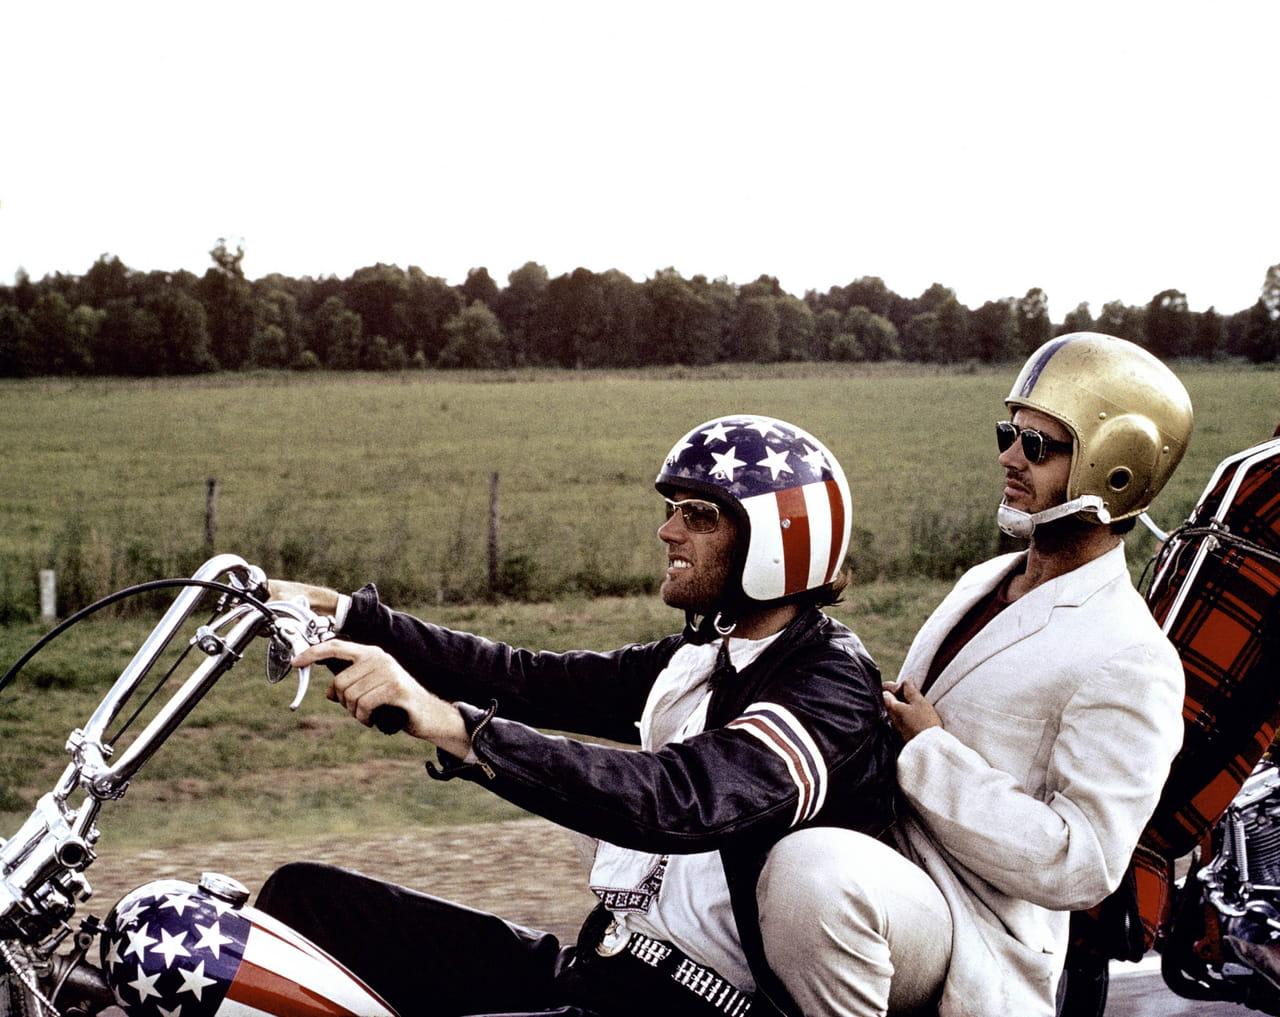 La vie de Peter Fonda en images